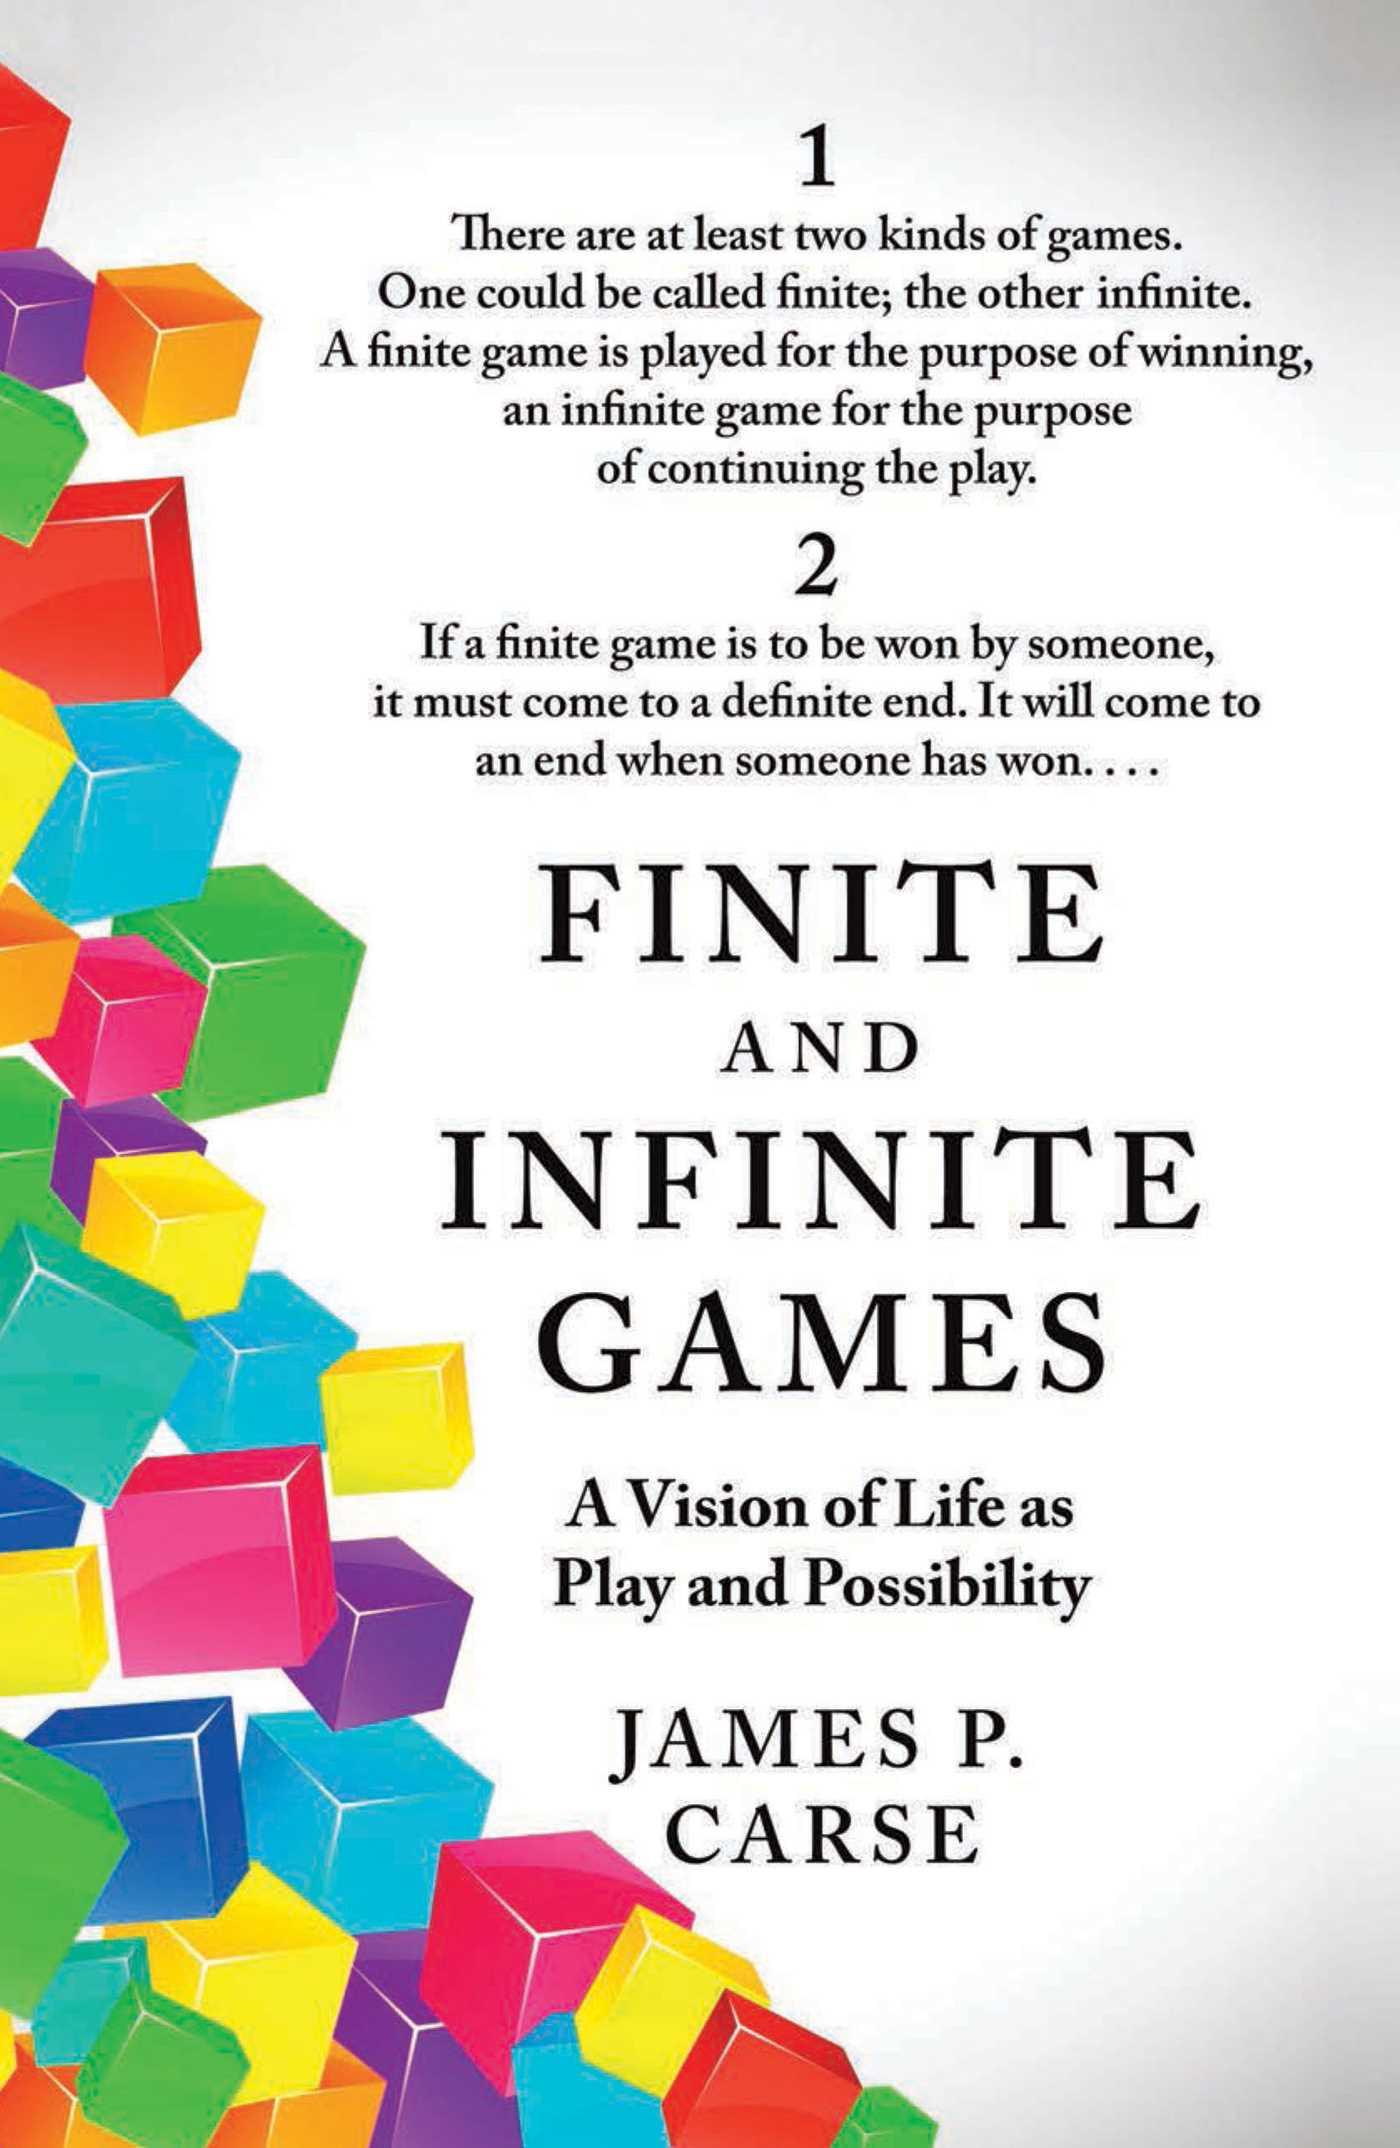 Finite and infinite games 9781451657296 hr